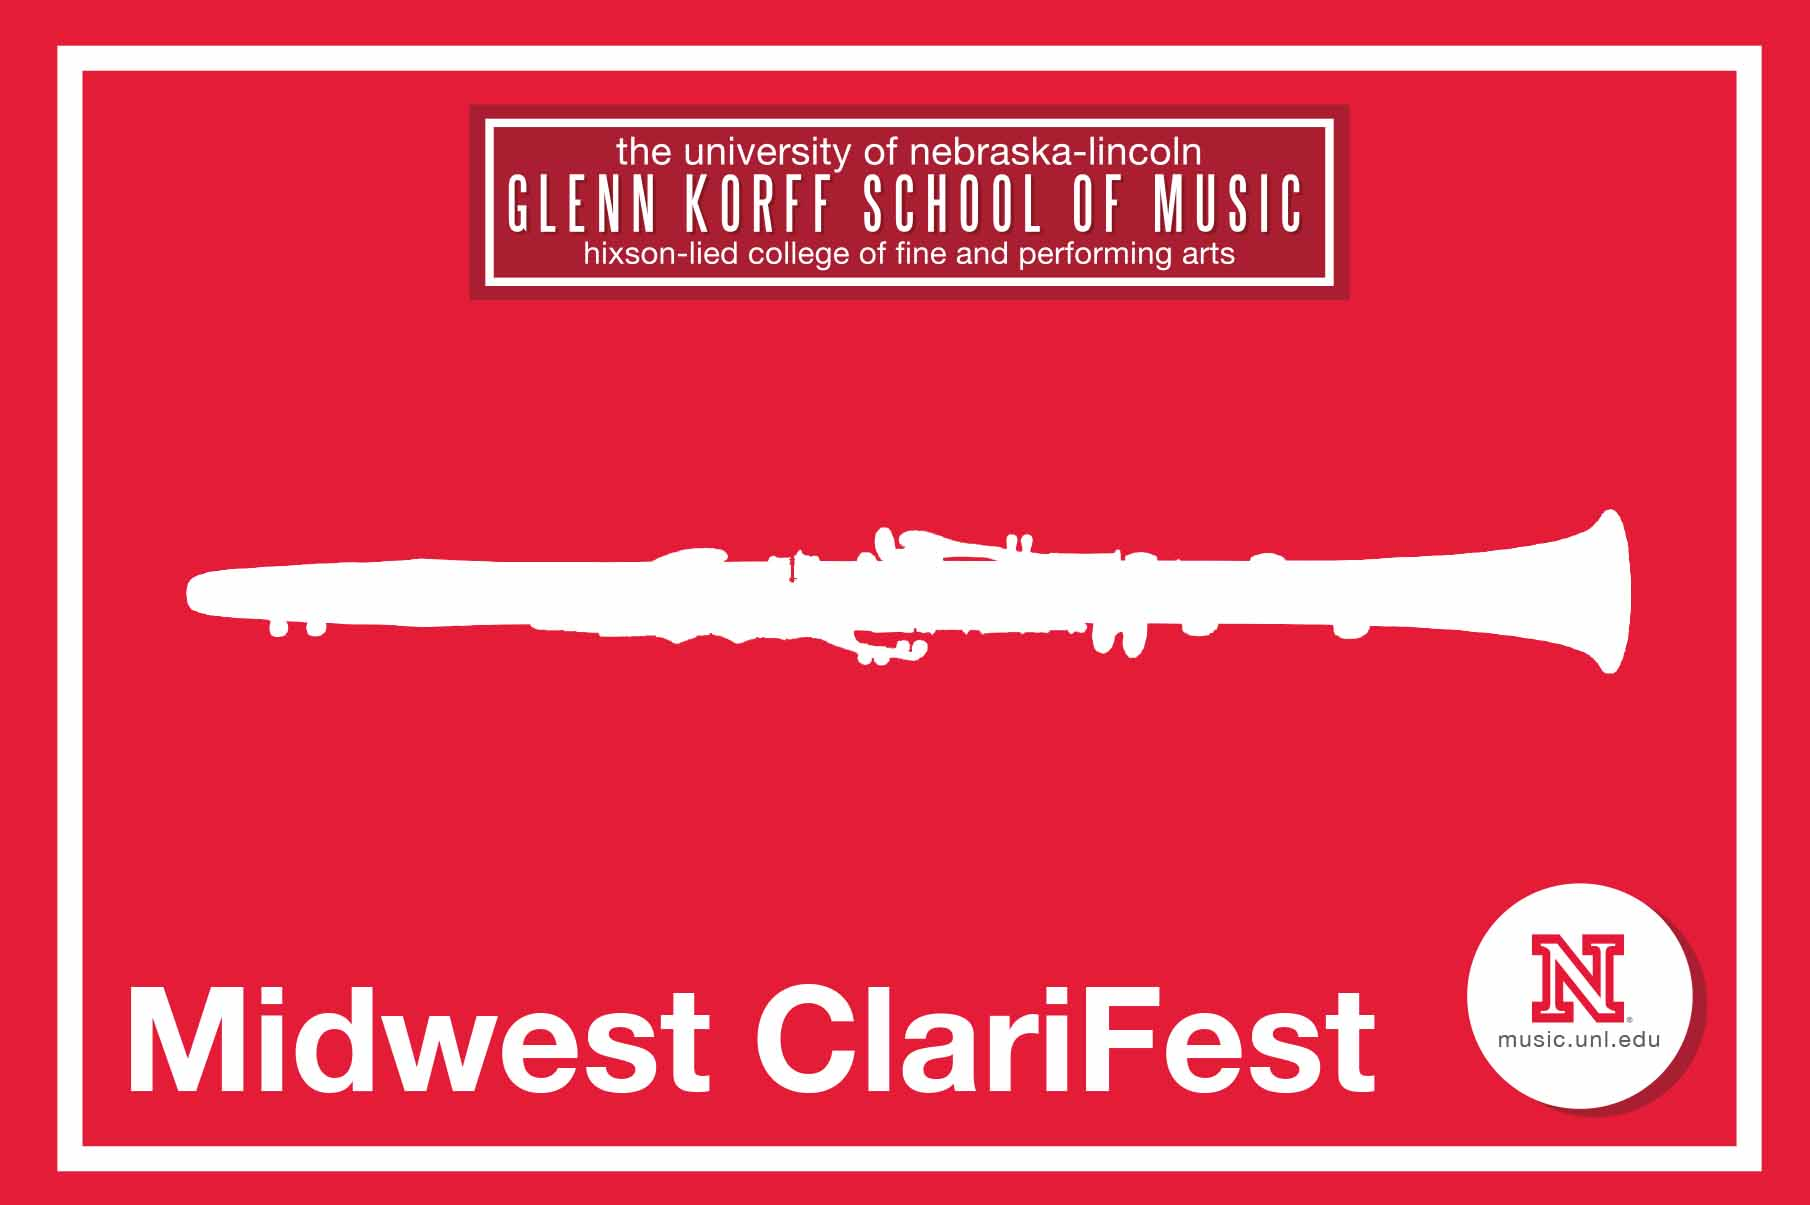 midwest clarifest logo 2015